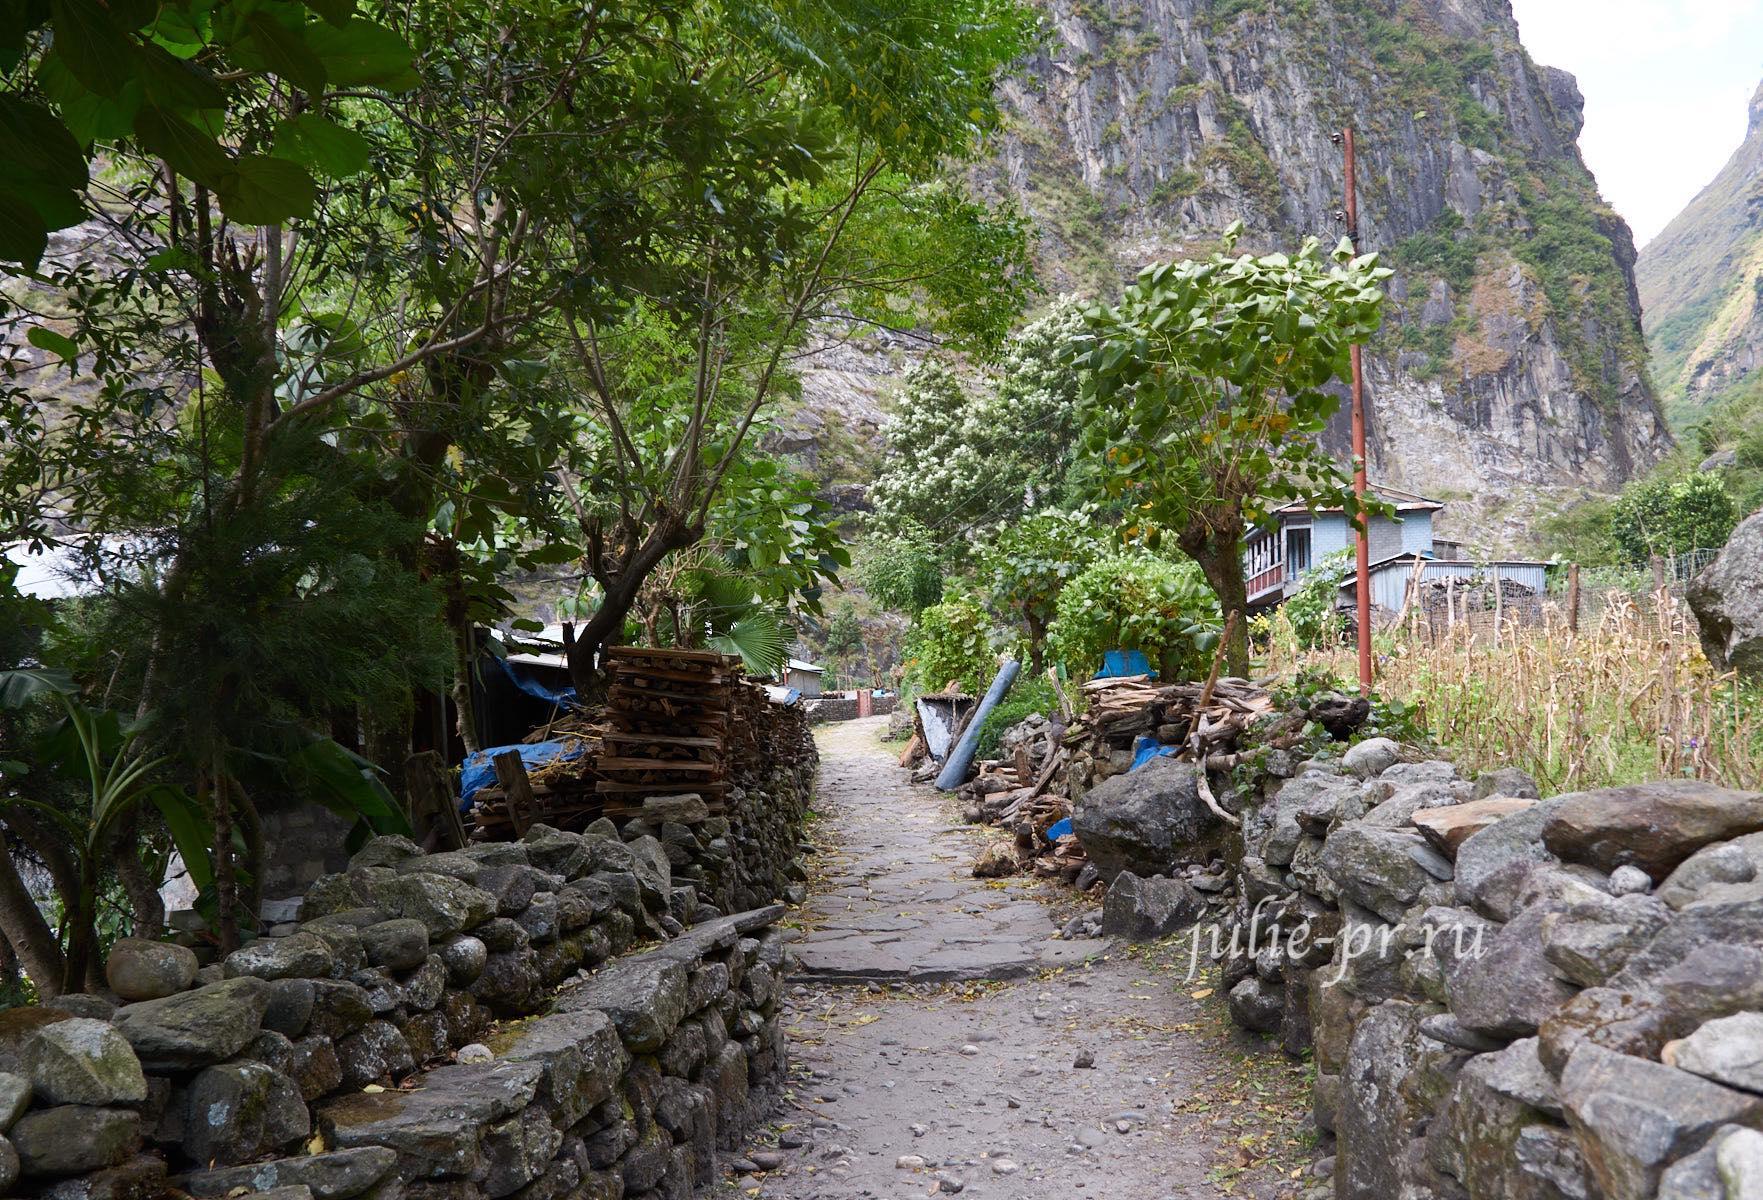 Непал, Трек вокруг Аннапурны, деревня Сиран-Тал